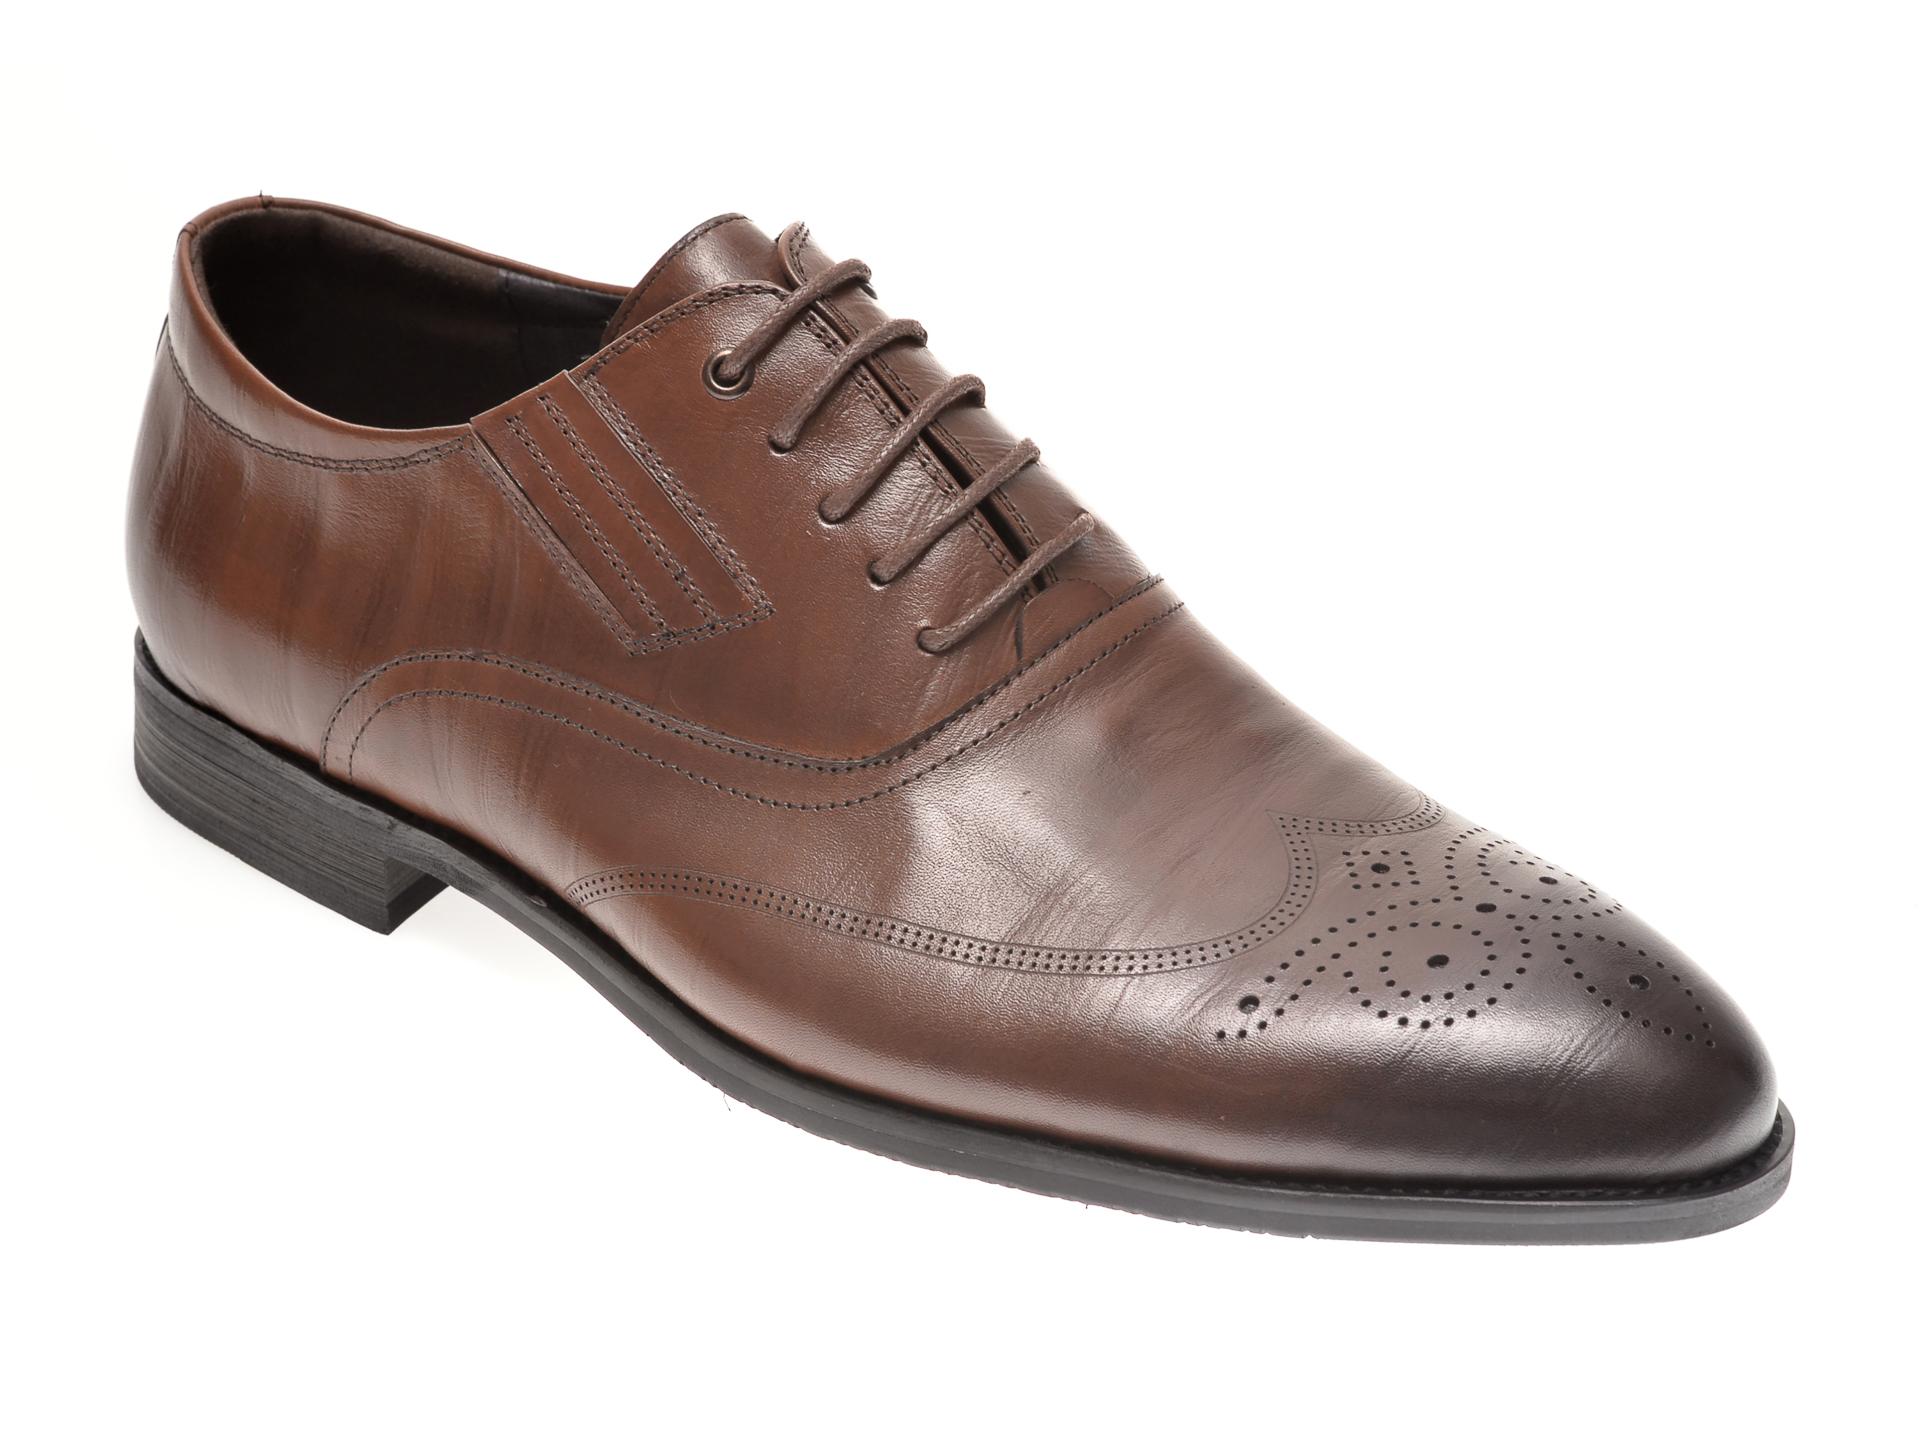 Pantofi OTTER maro, F6063, din piele naturala imagine